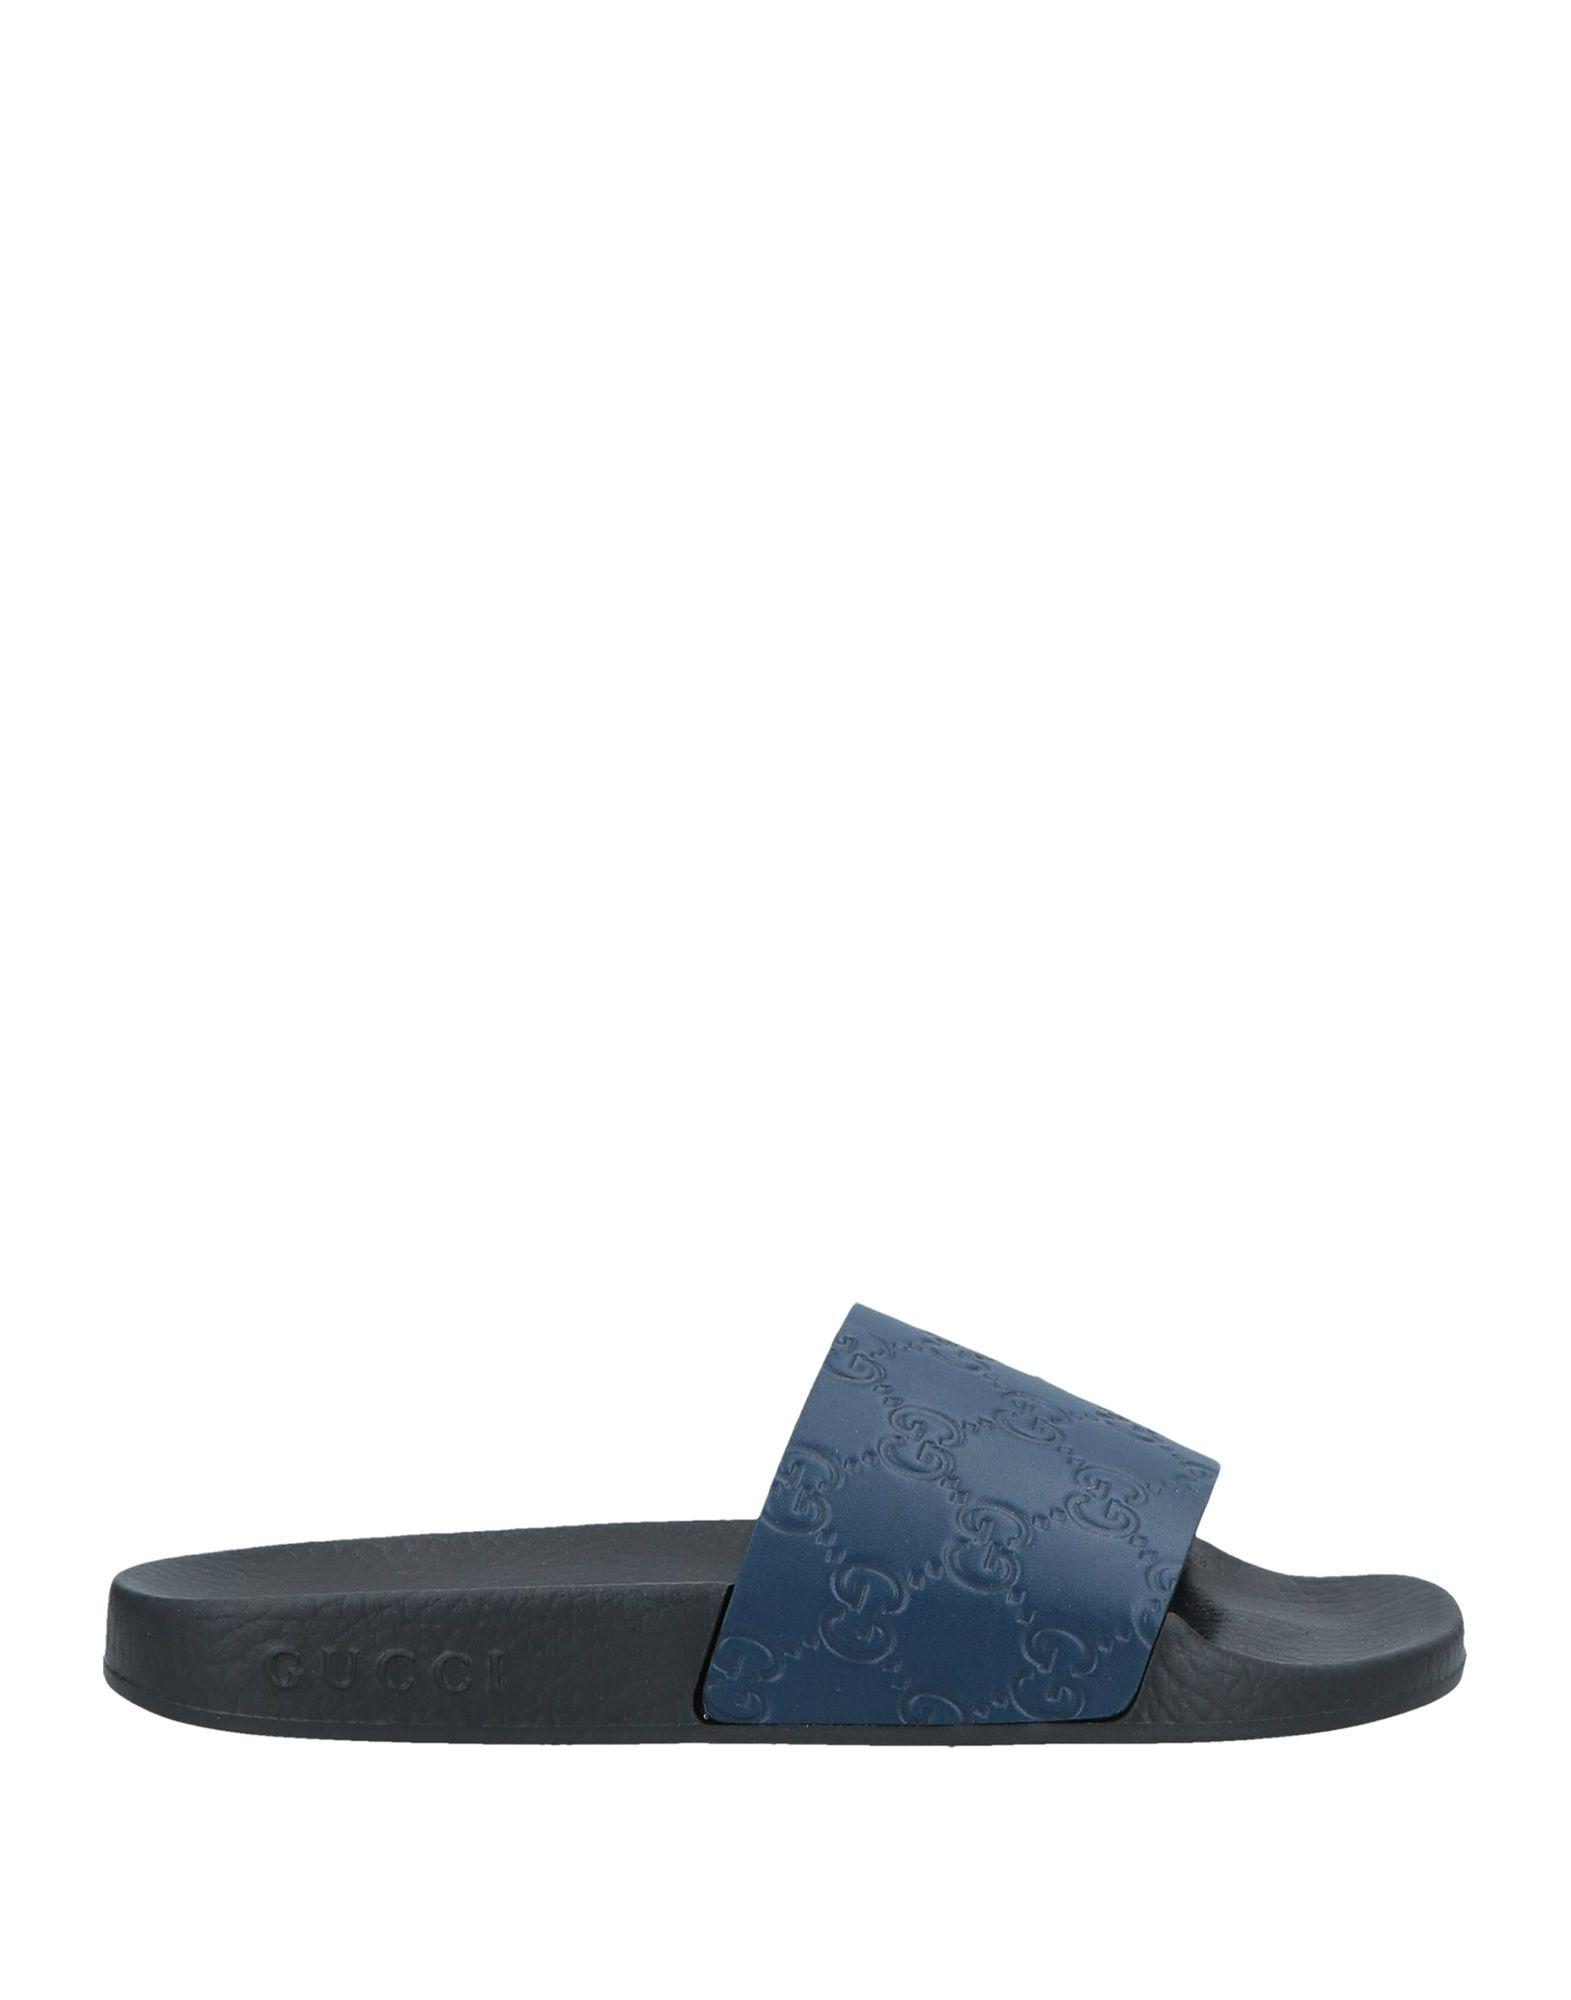 5b70fccbb8e Lyst - Gucci Sandals in Blue - Save 38%